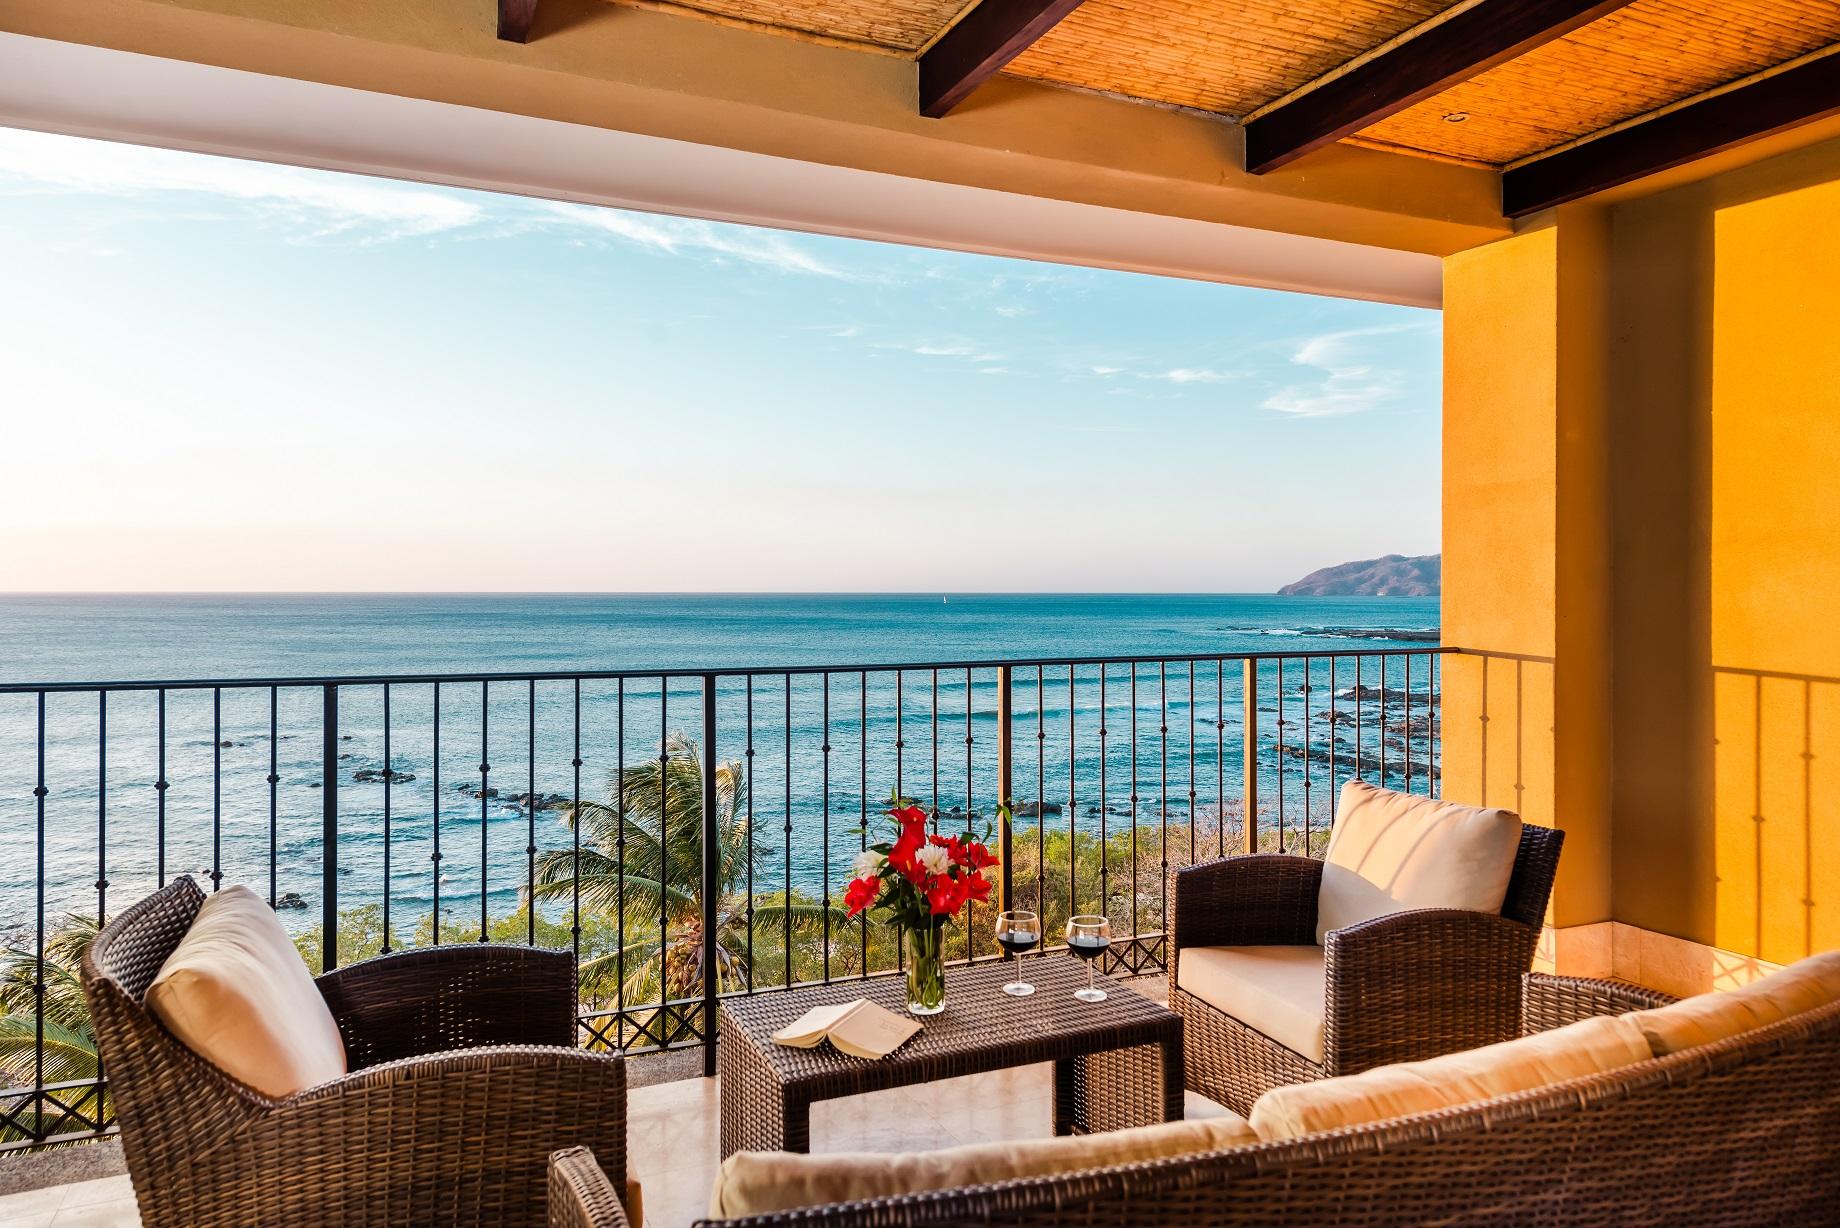 Crystal Sands penthouse in Playa Langosta